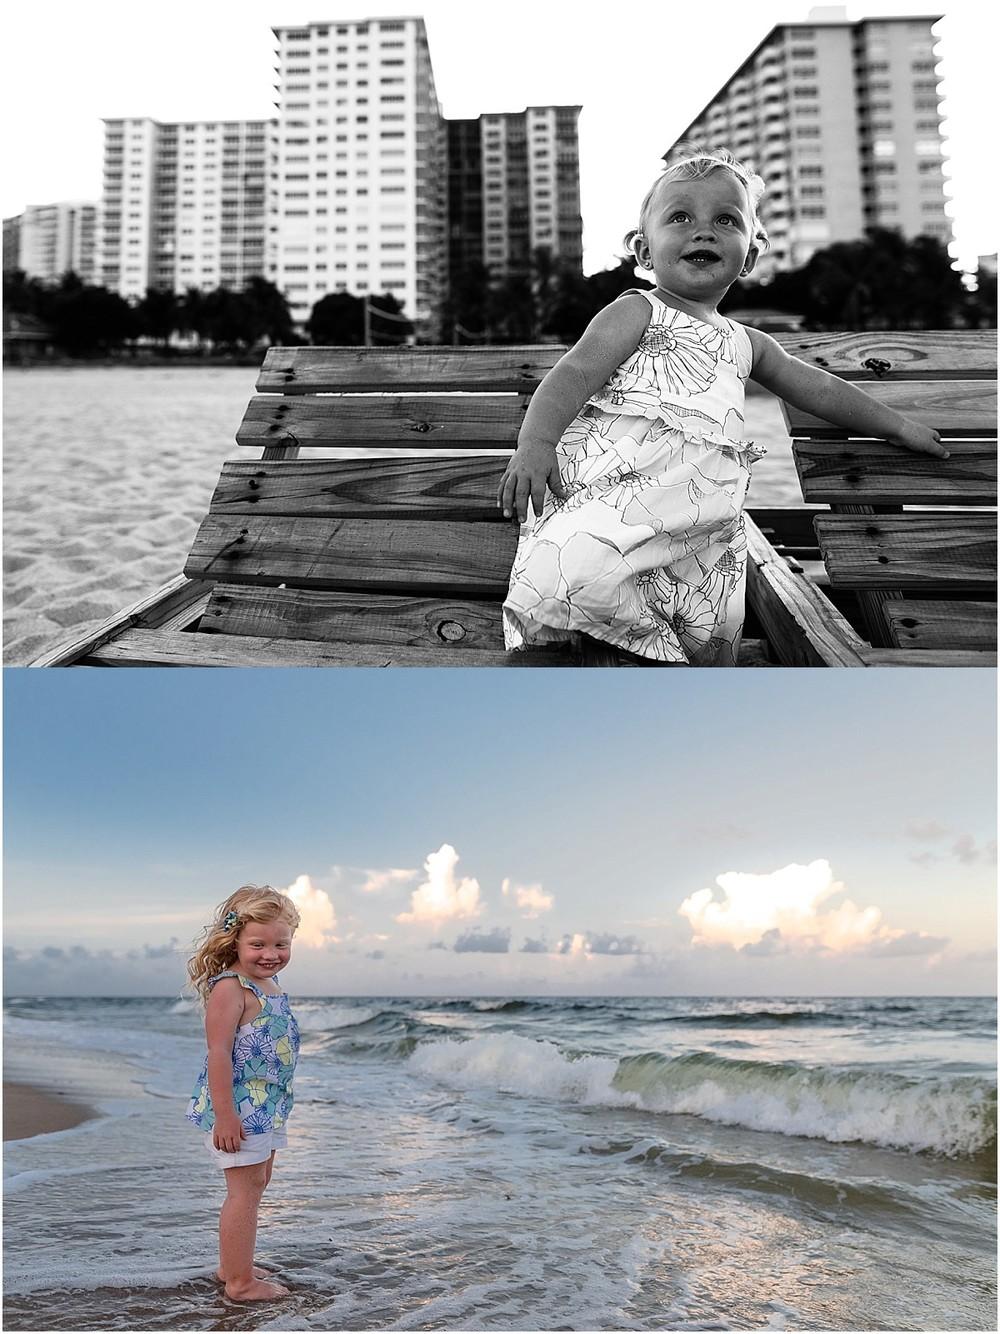 Ashley_Rogers_Photography_South_Florida_Photographer_Orlando_Photographer_Costa_Rica_Photographer_0844.jpg